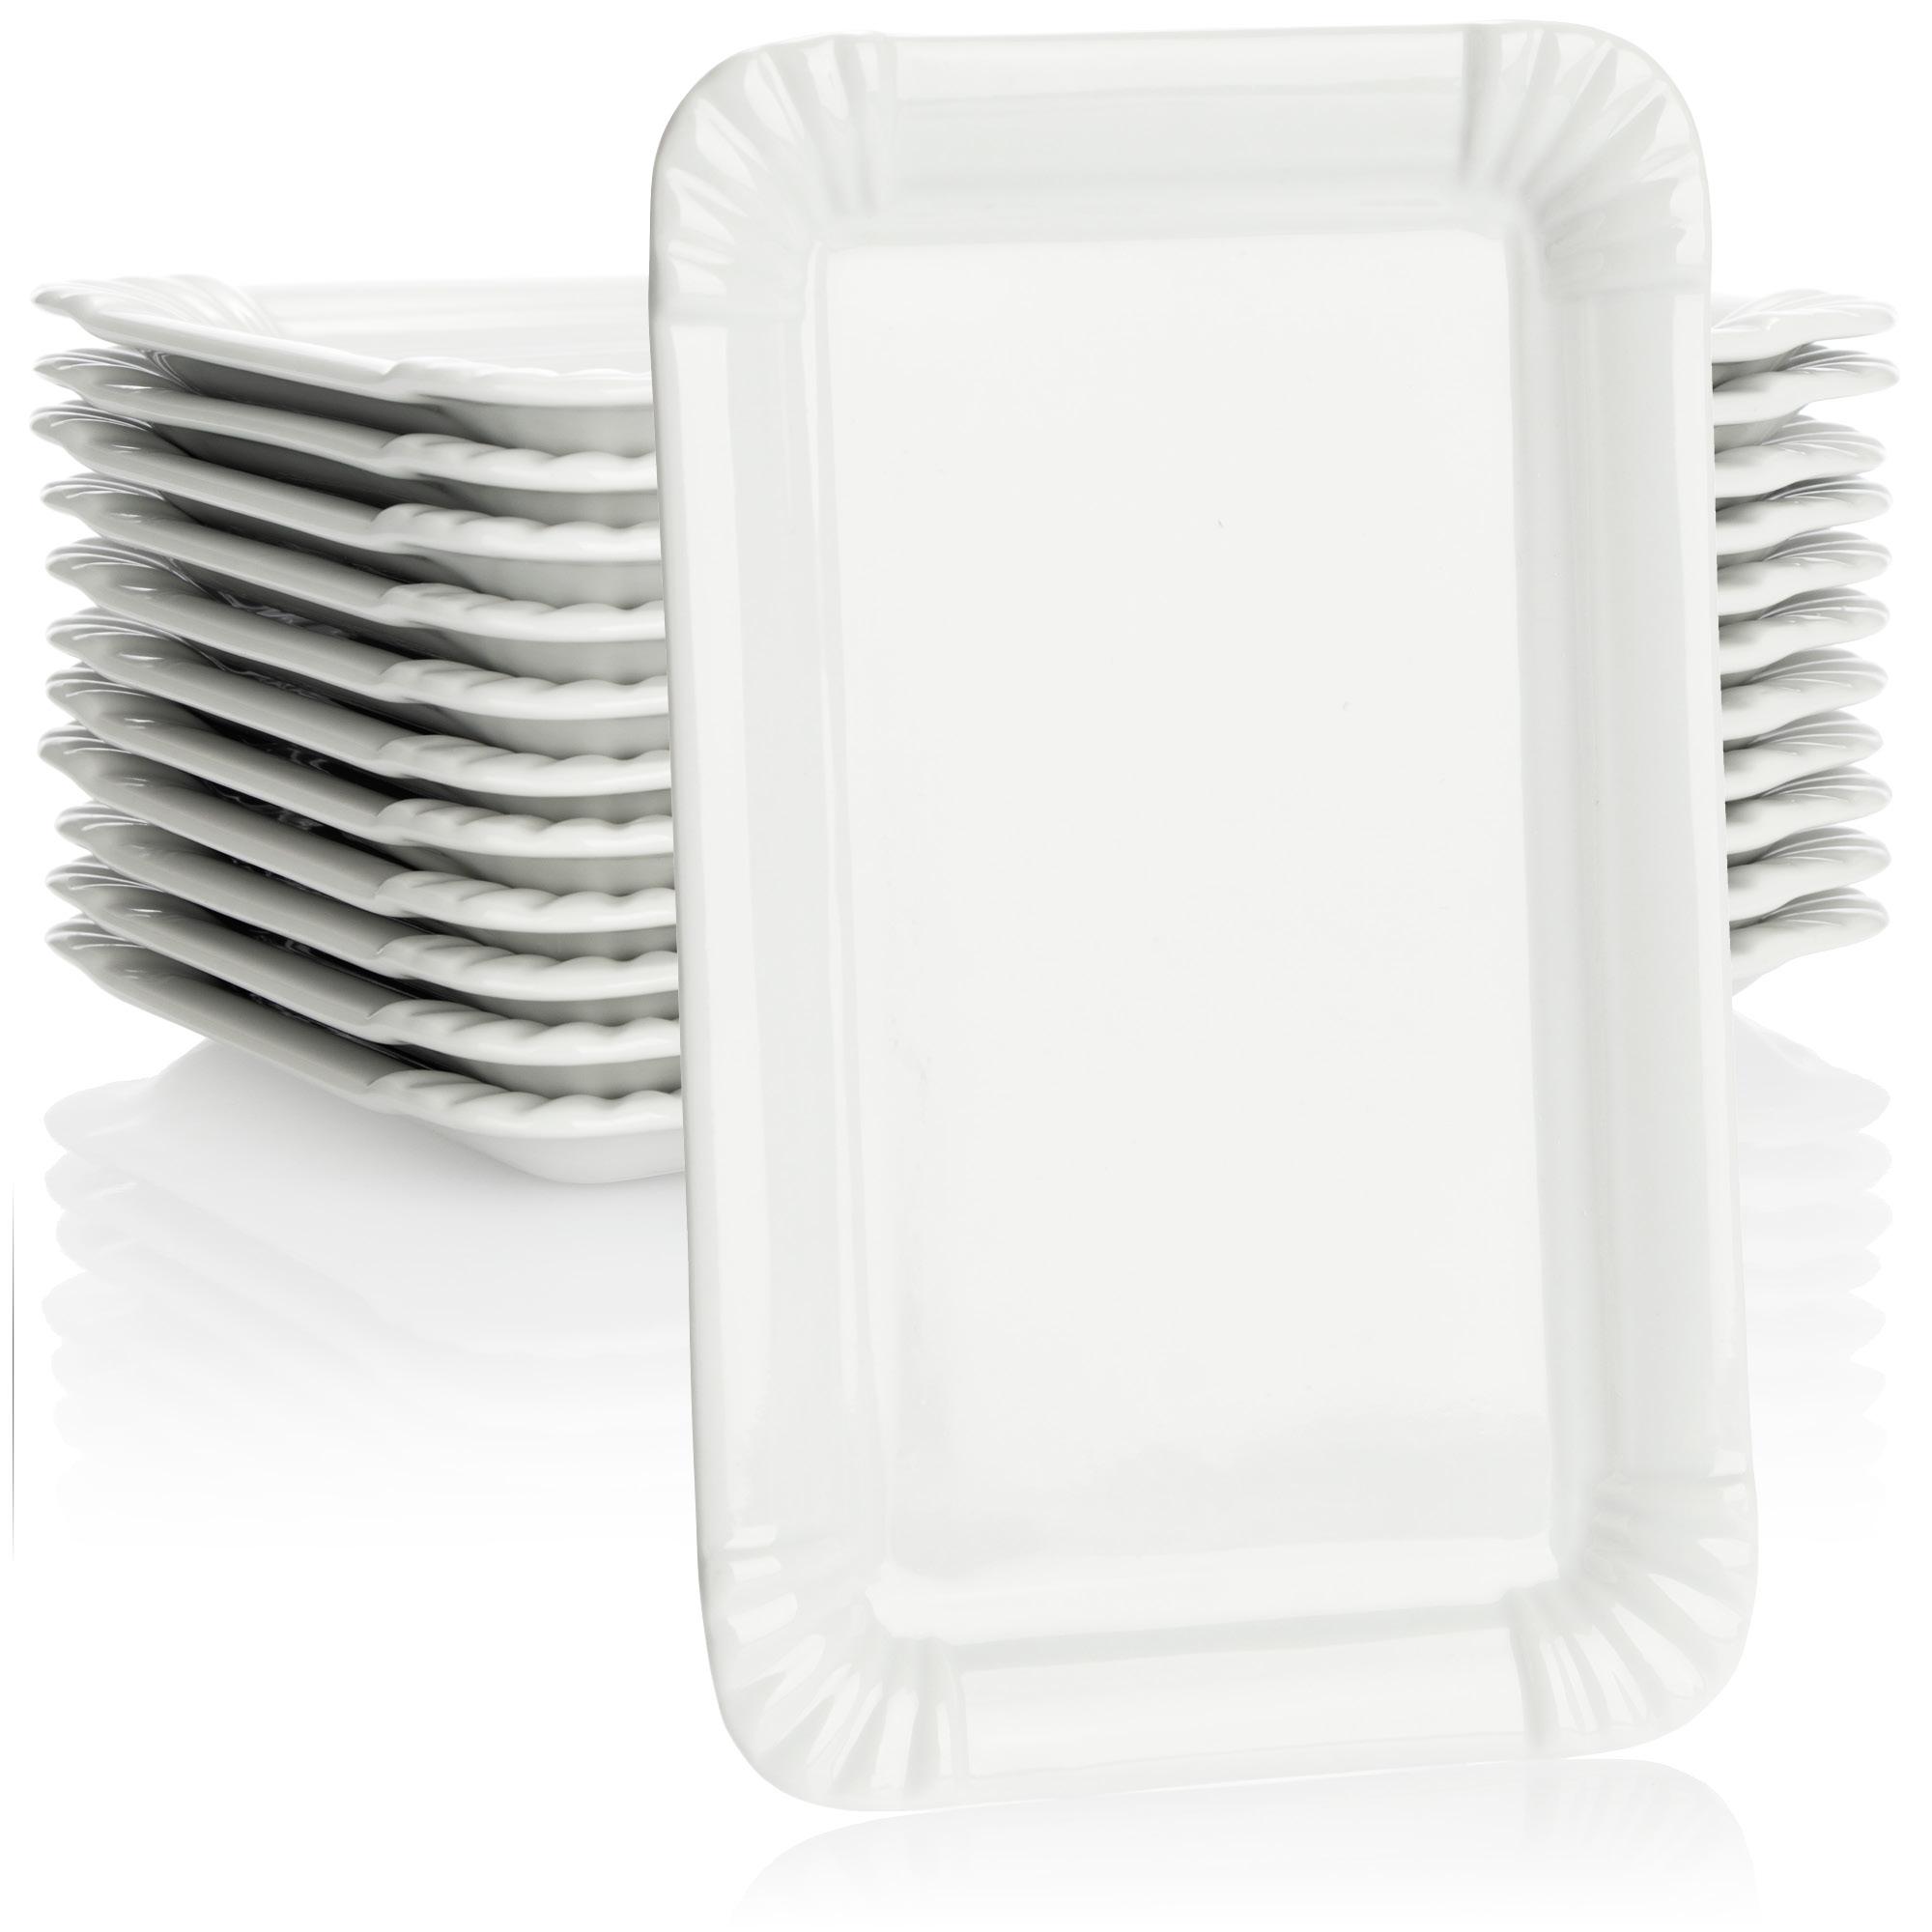 BergHOFF Hotel Line Suppenteller Suppenschüssel Teller Porzellan Weiß 21.5 cm